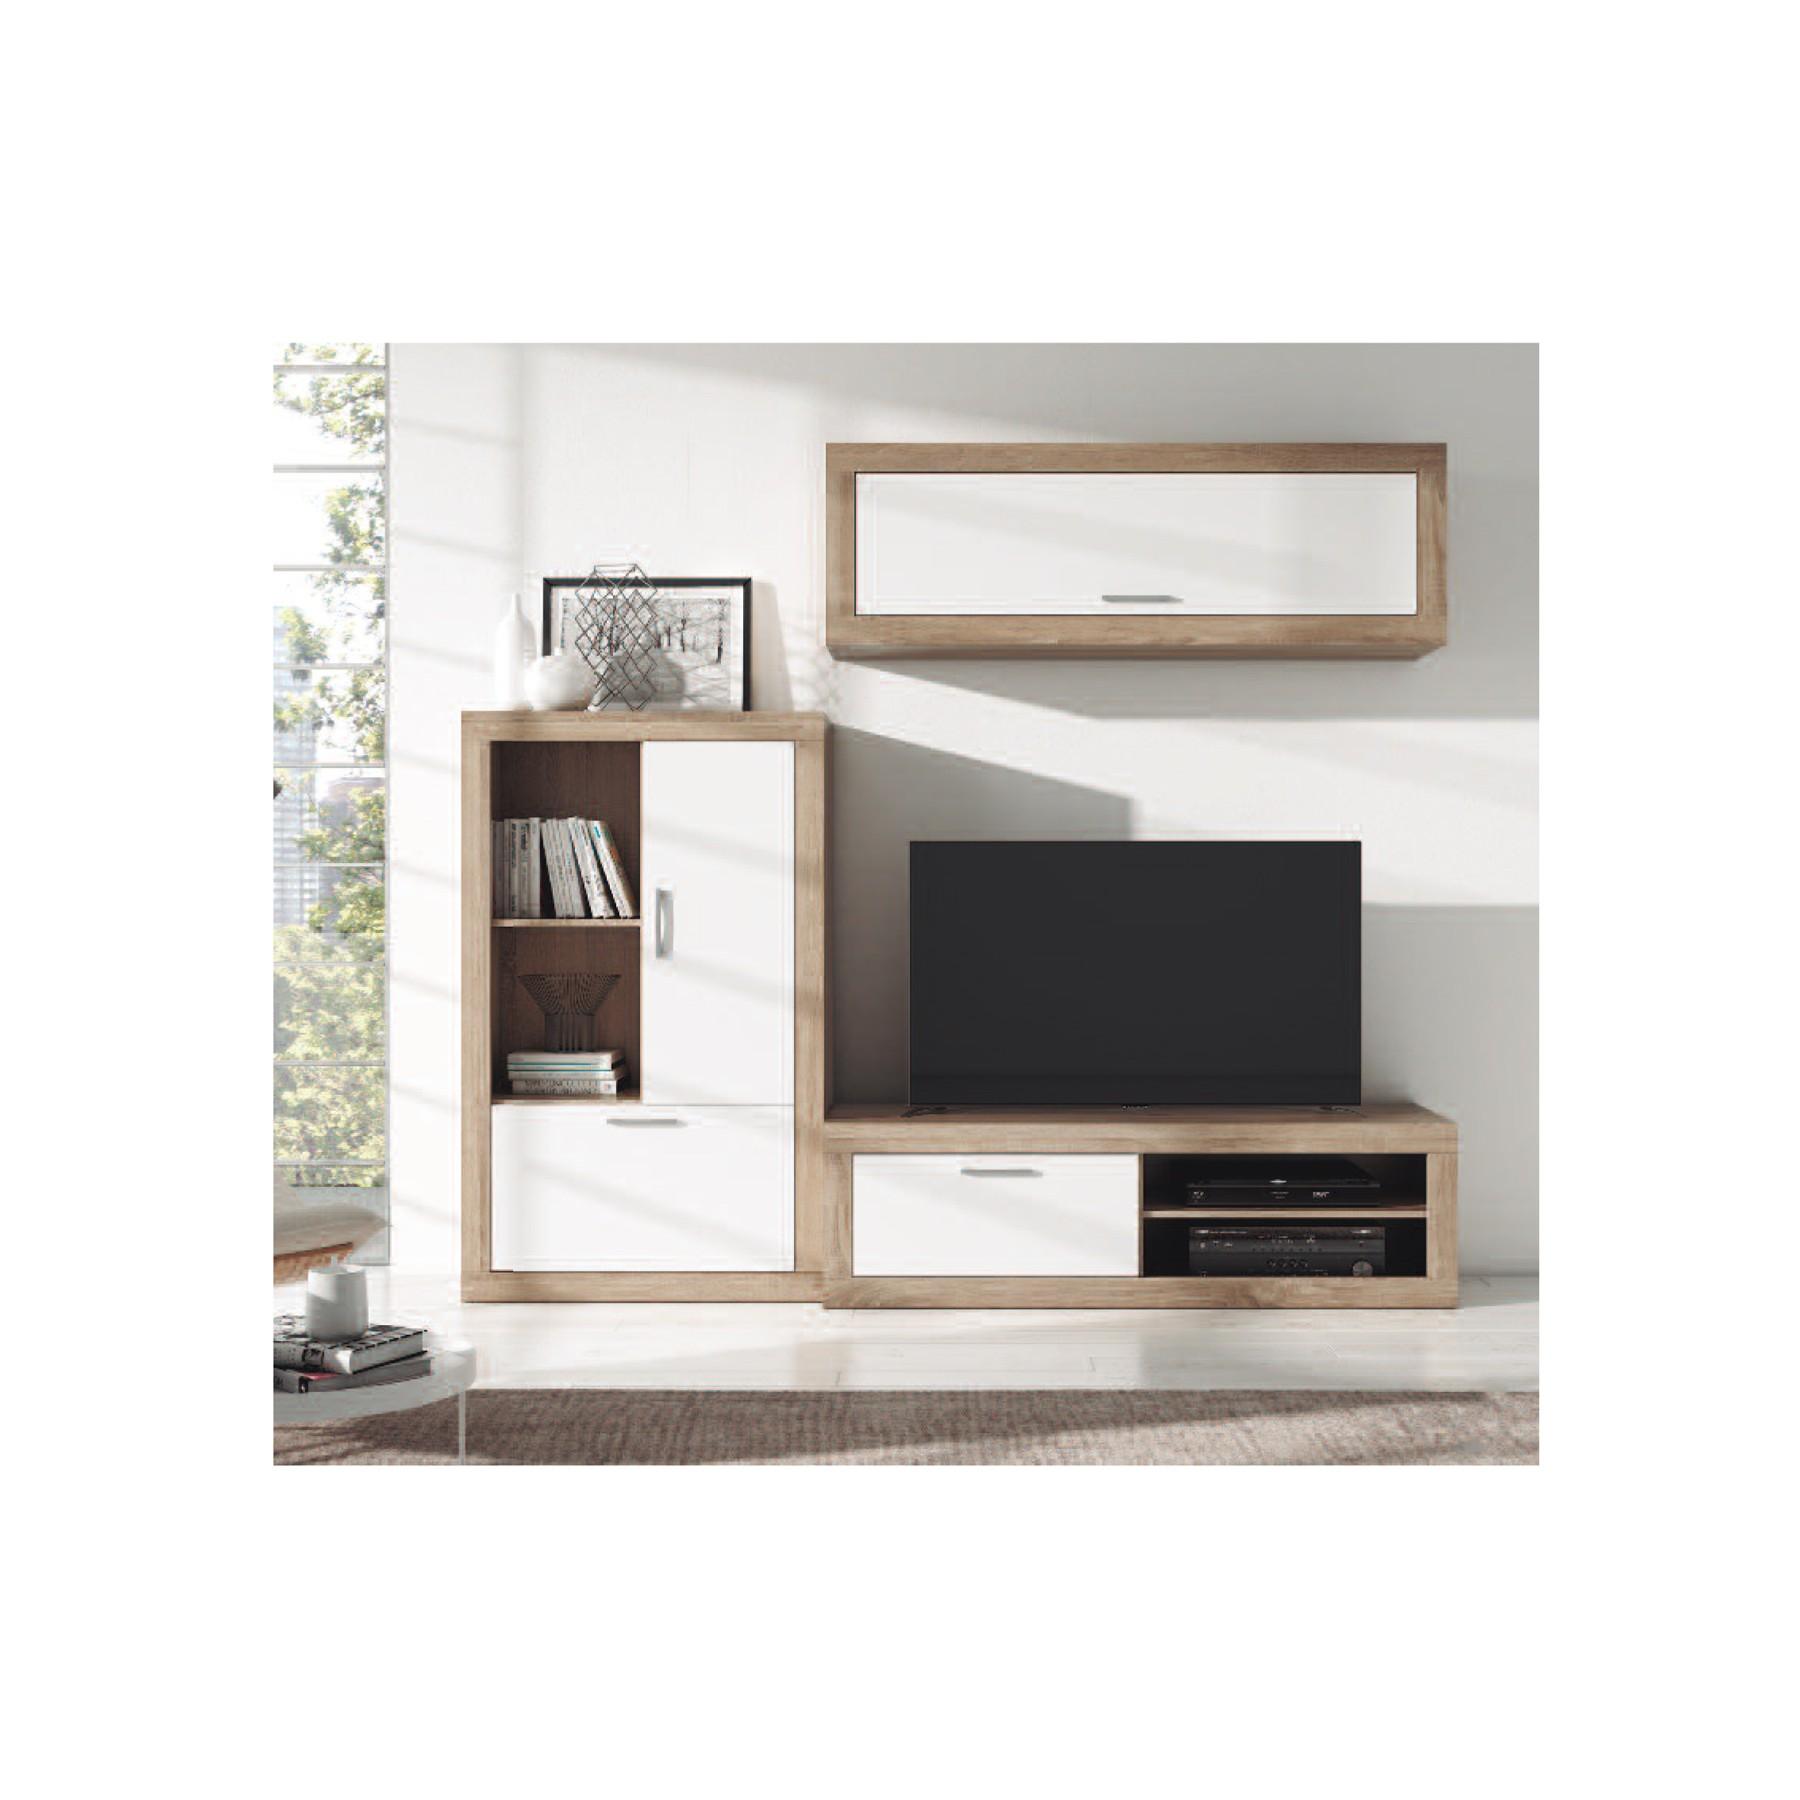 Mueble bajo tv modelo padua for Mueble auxiliar tv